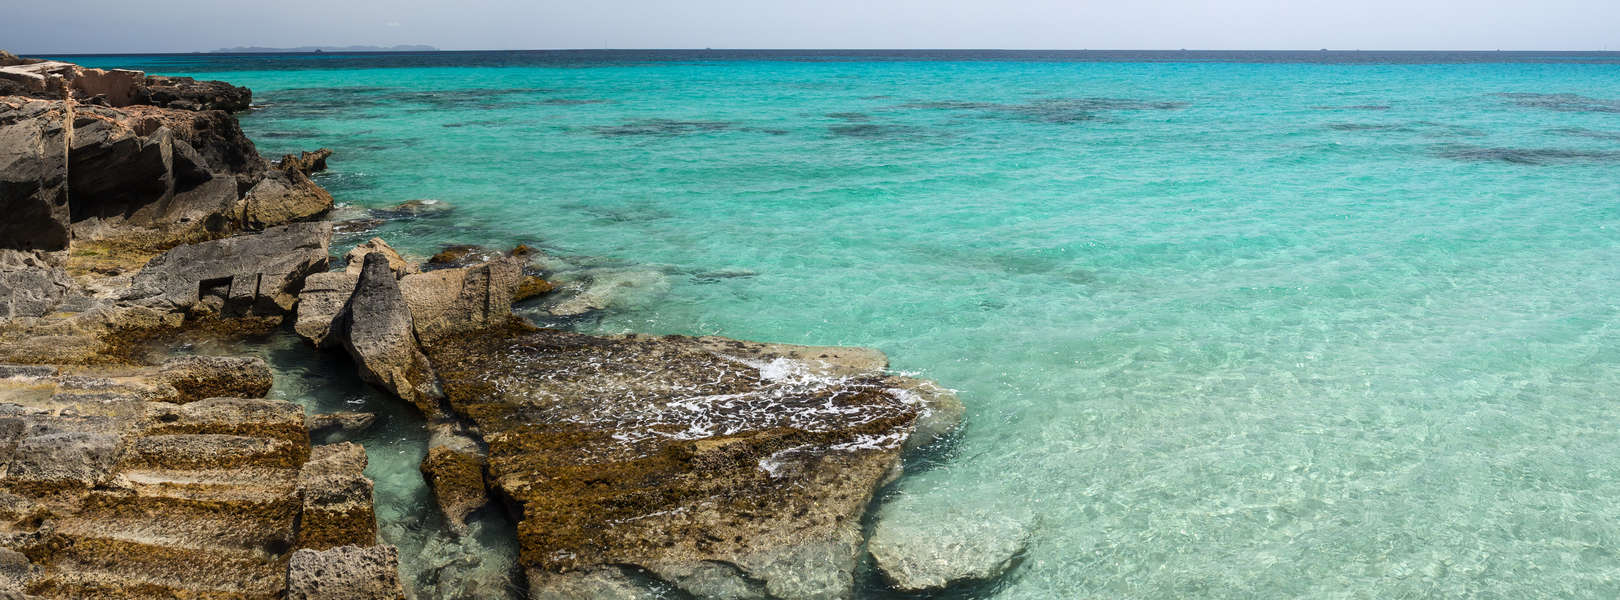 Der Naturstrand Platja es Trenc im Süde auf Mallorca